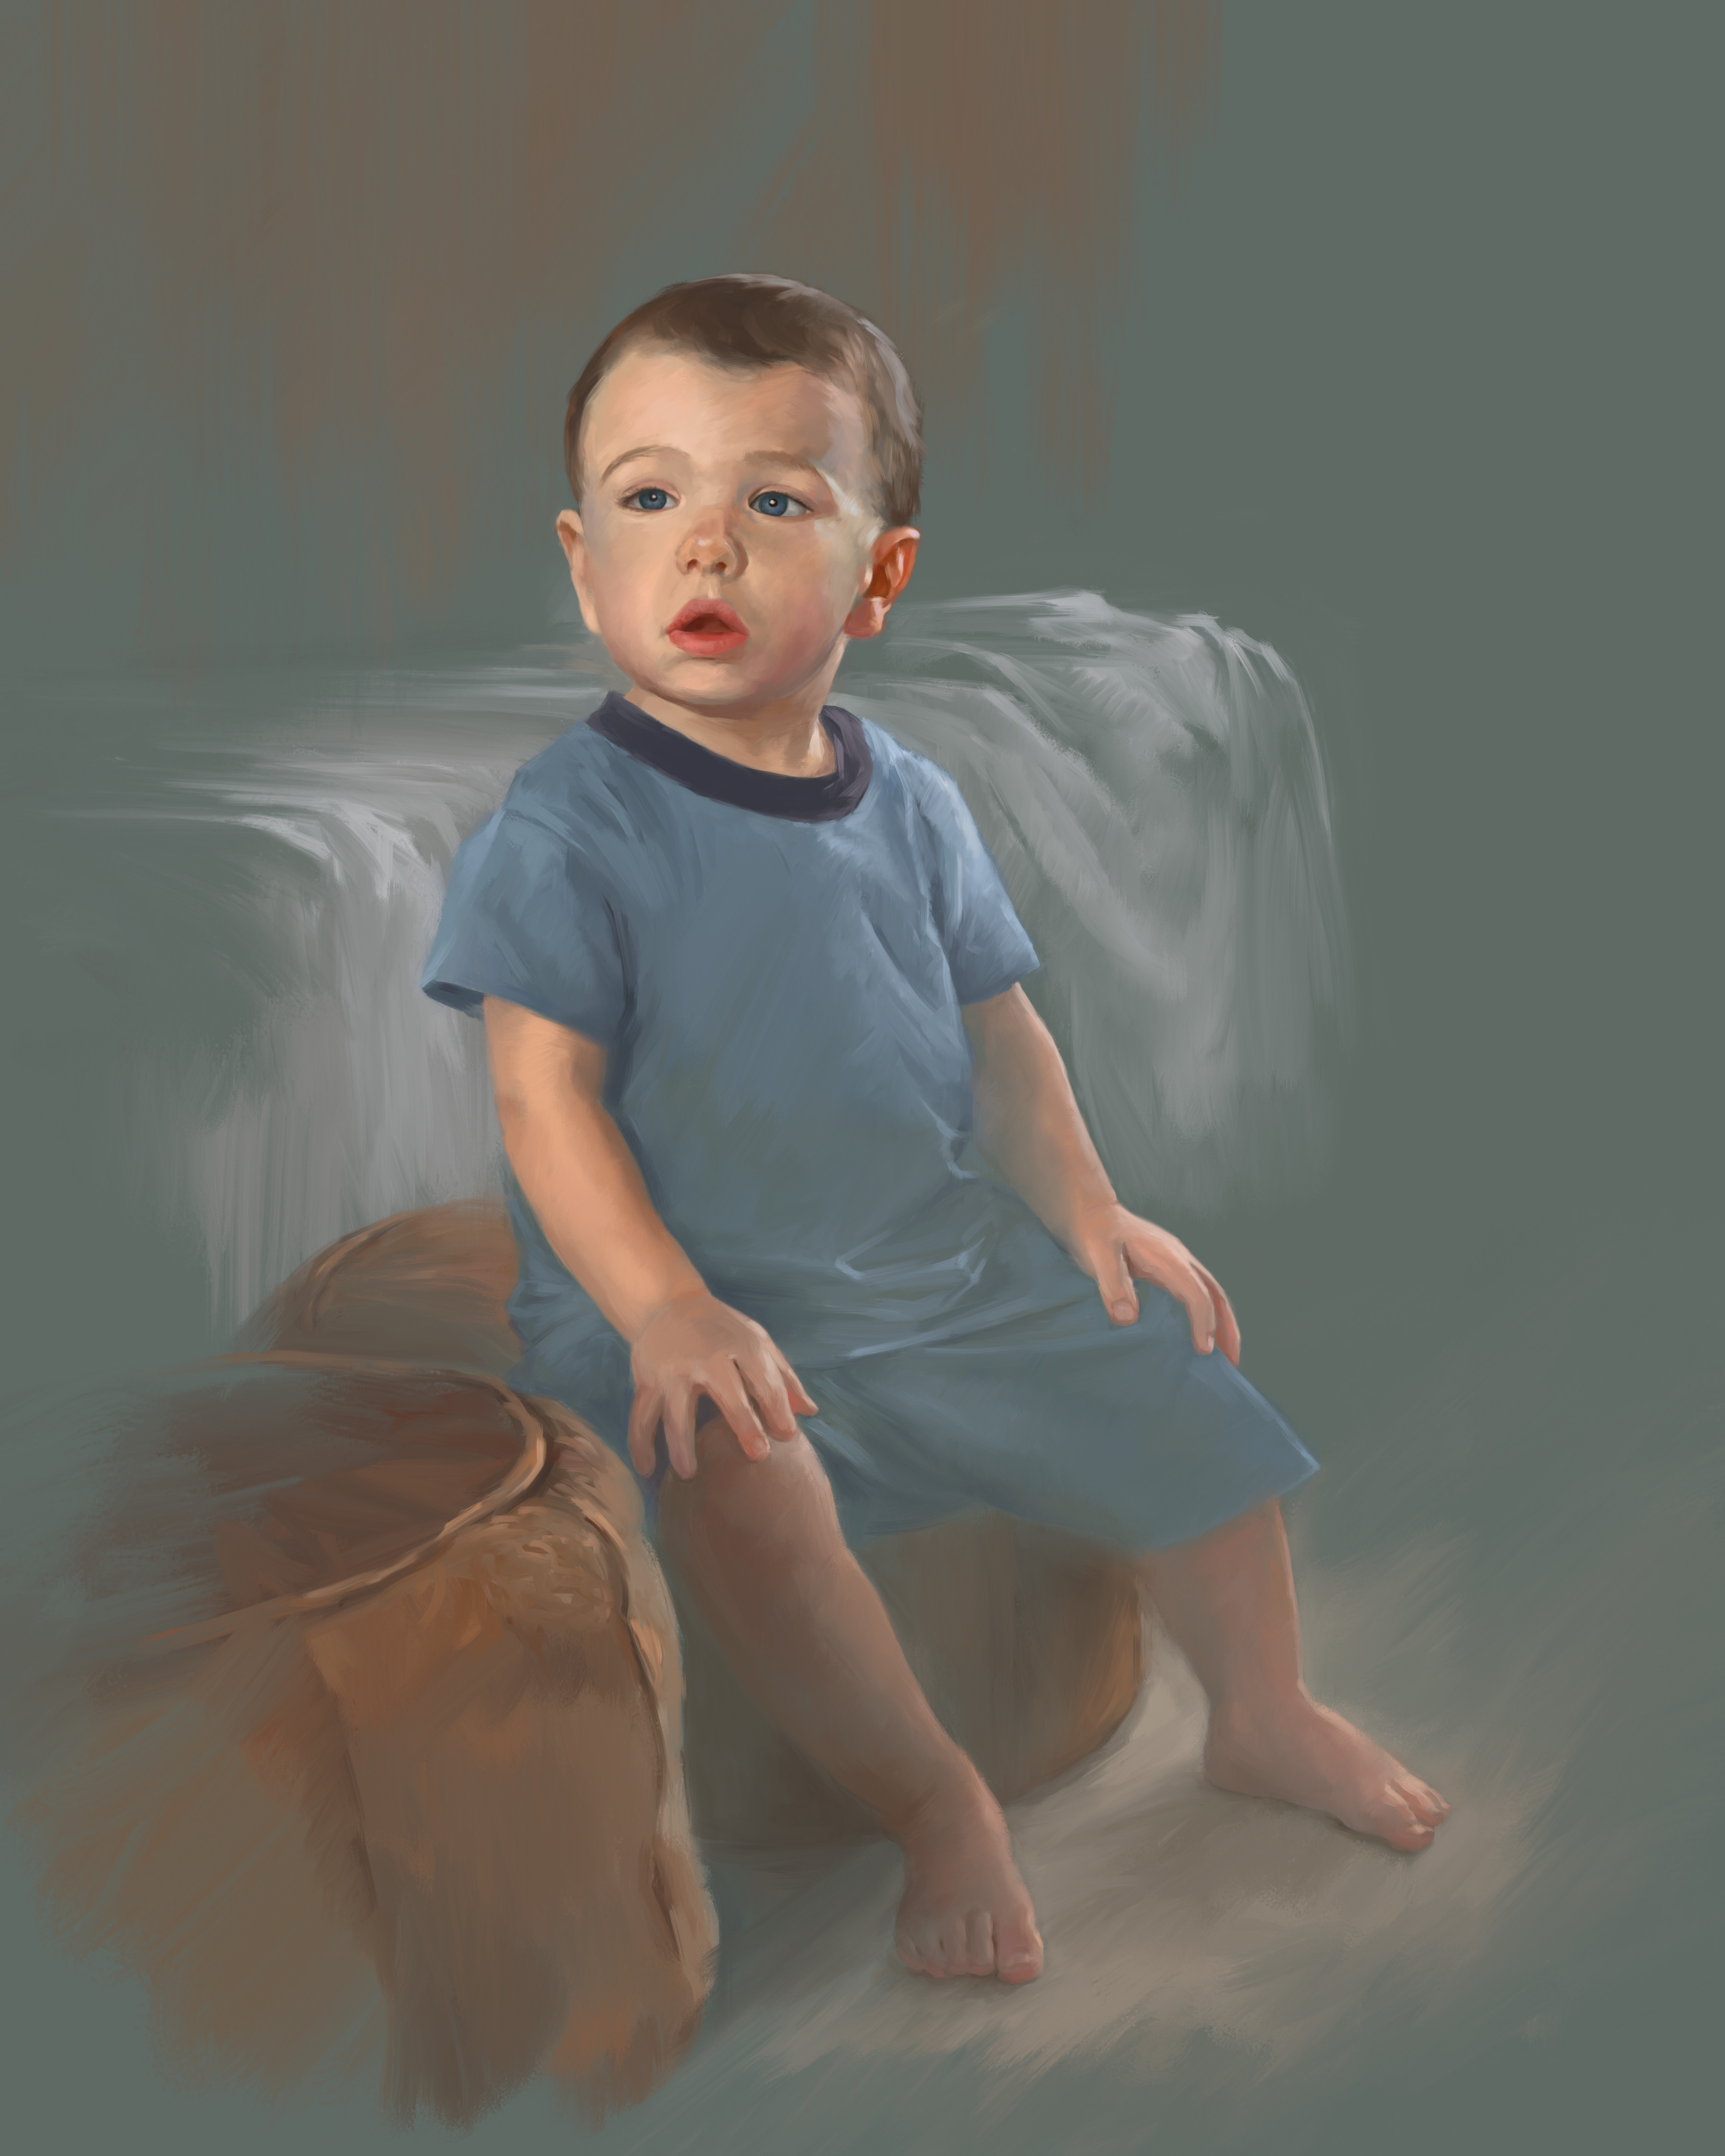 Painted using Autodesk Sketchbook Pro.